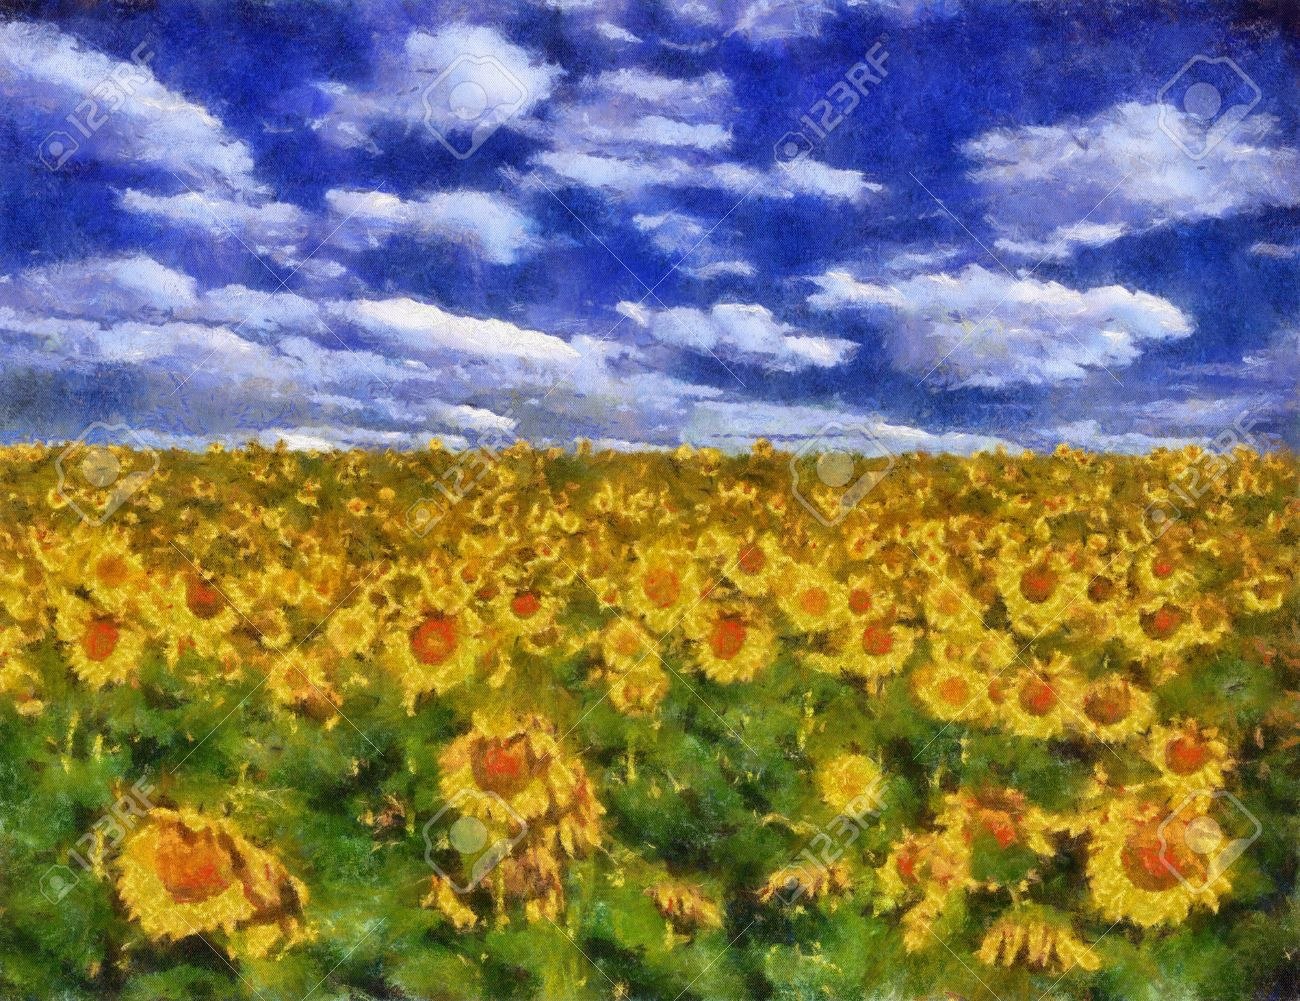 Sunflower field under blue sky background oil painting (Benson Style) Stock Photo - 8363310